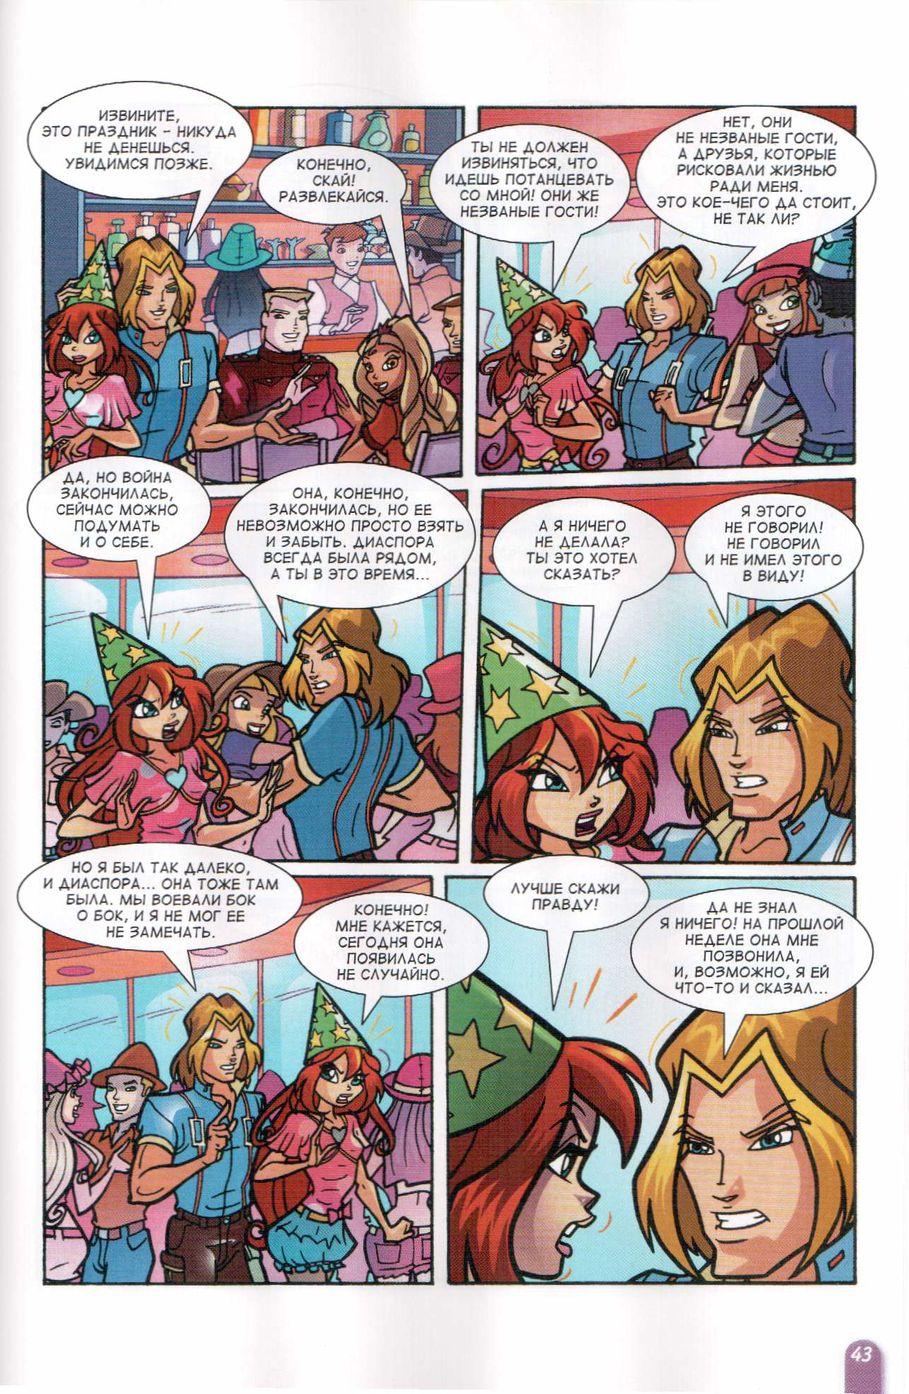 Комикс Винкс Winx - Любовь и ревность (Журнал Винкс №7 2011) - стр. 43